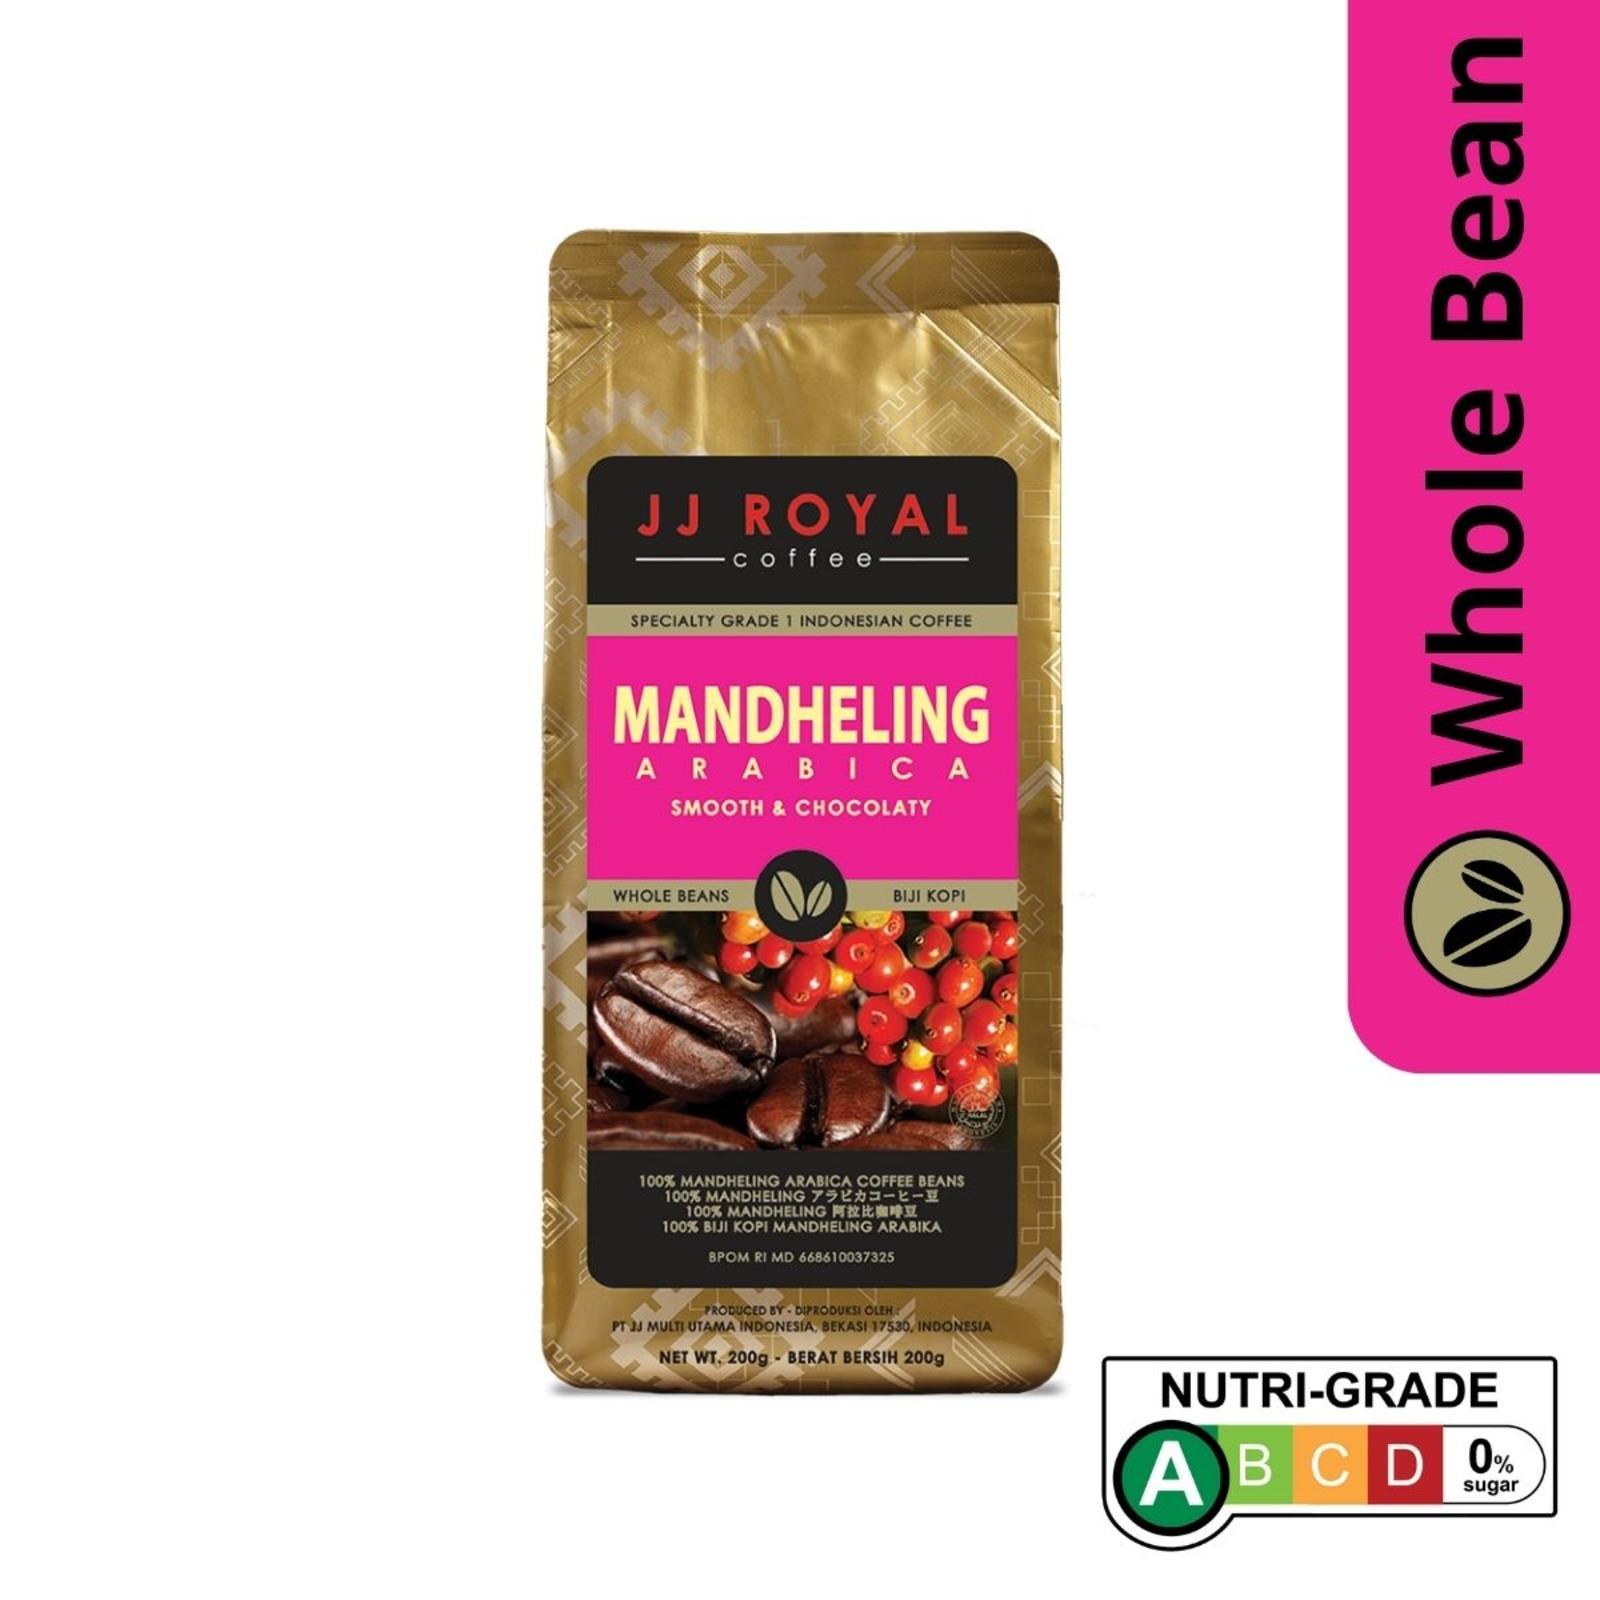 JJ Royal Coffee Mandheling 100% Arabica (Bean)